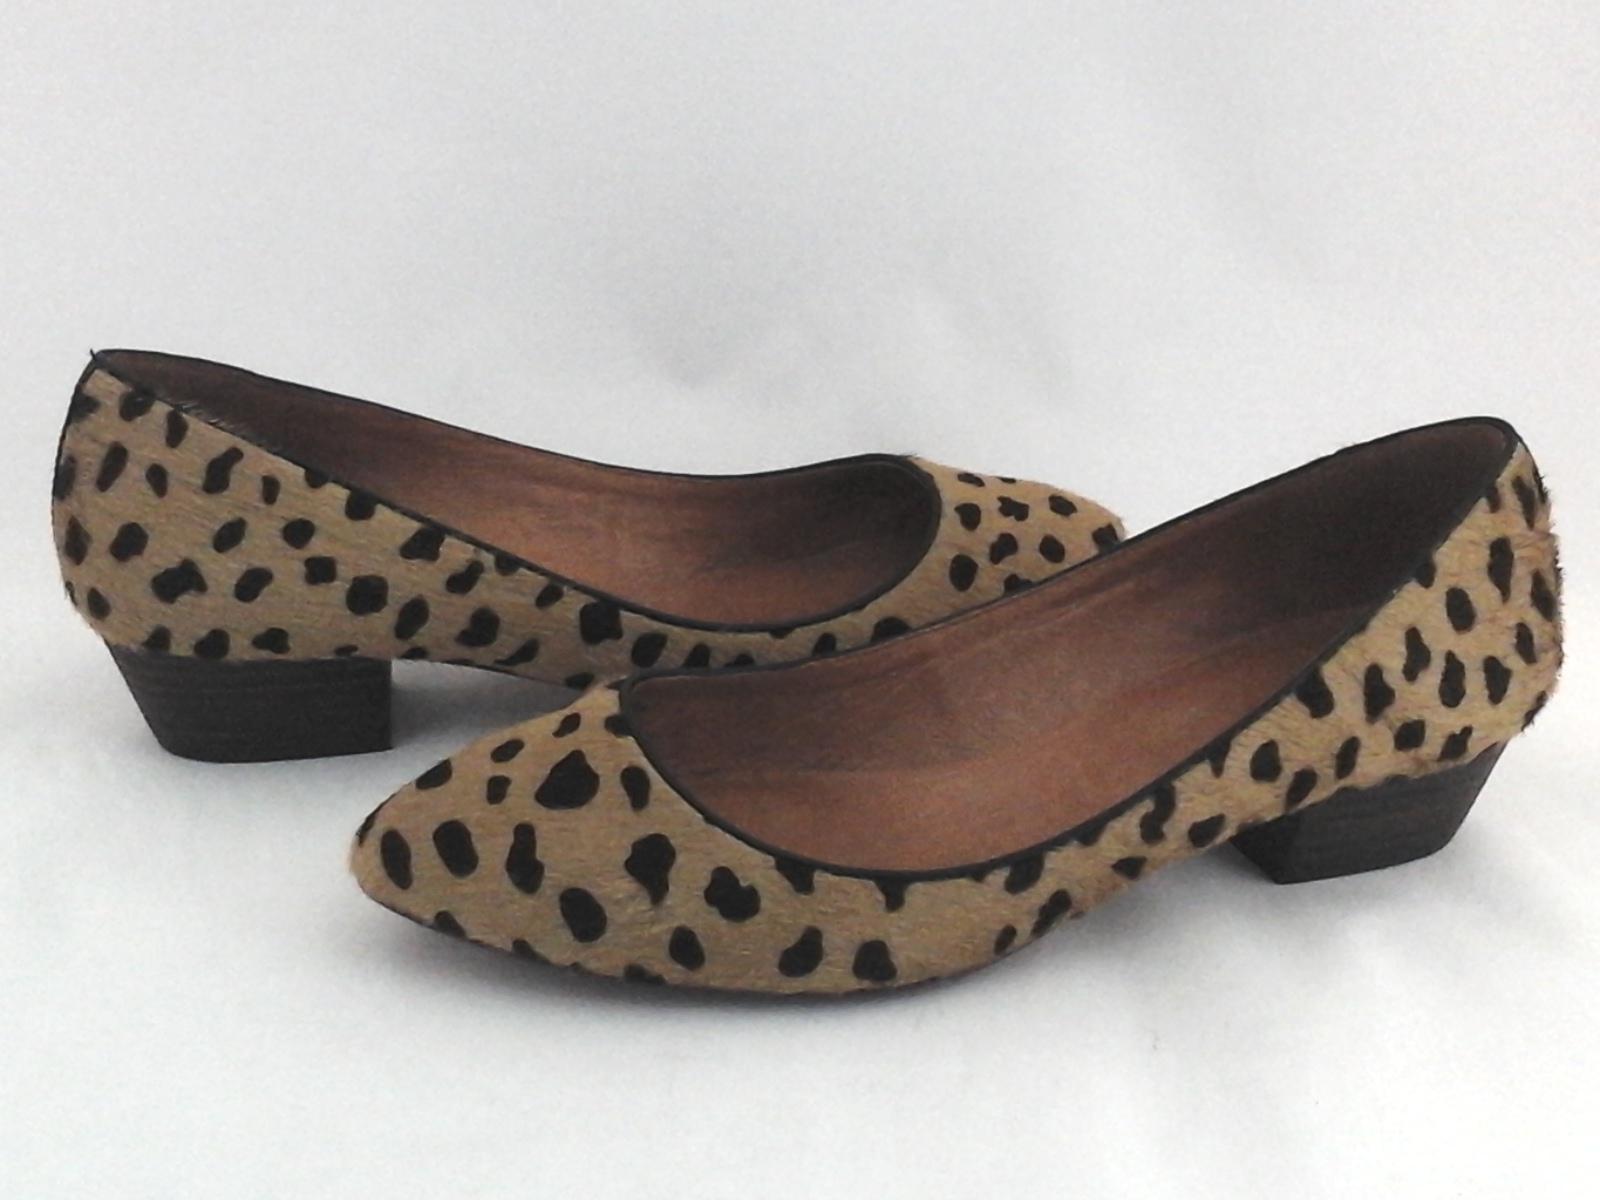 4c521dd0974 MADEWELL Leopard Low Heels Loafers Fur Black Tan Shoes 09167 US 10 EU 41   118